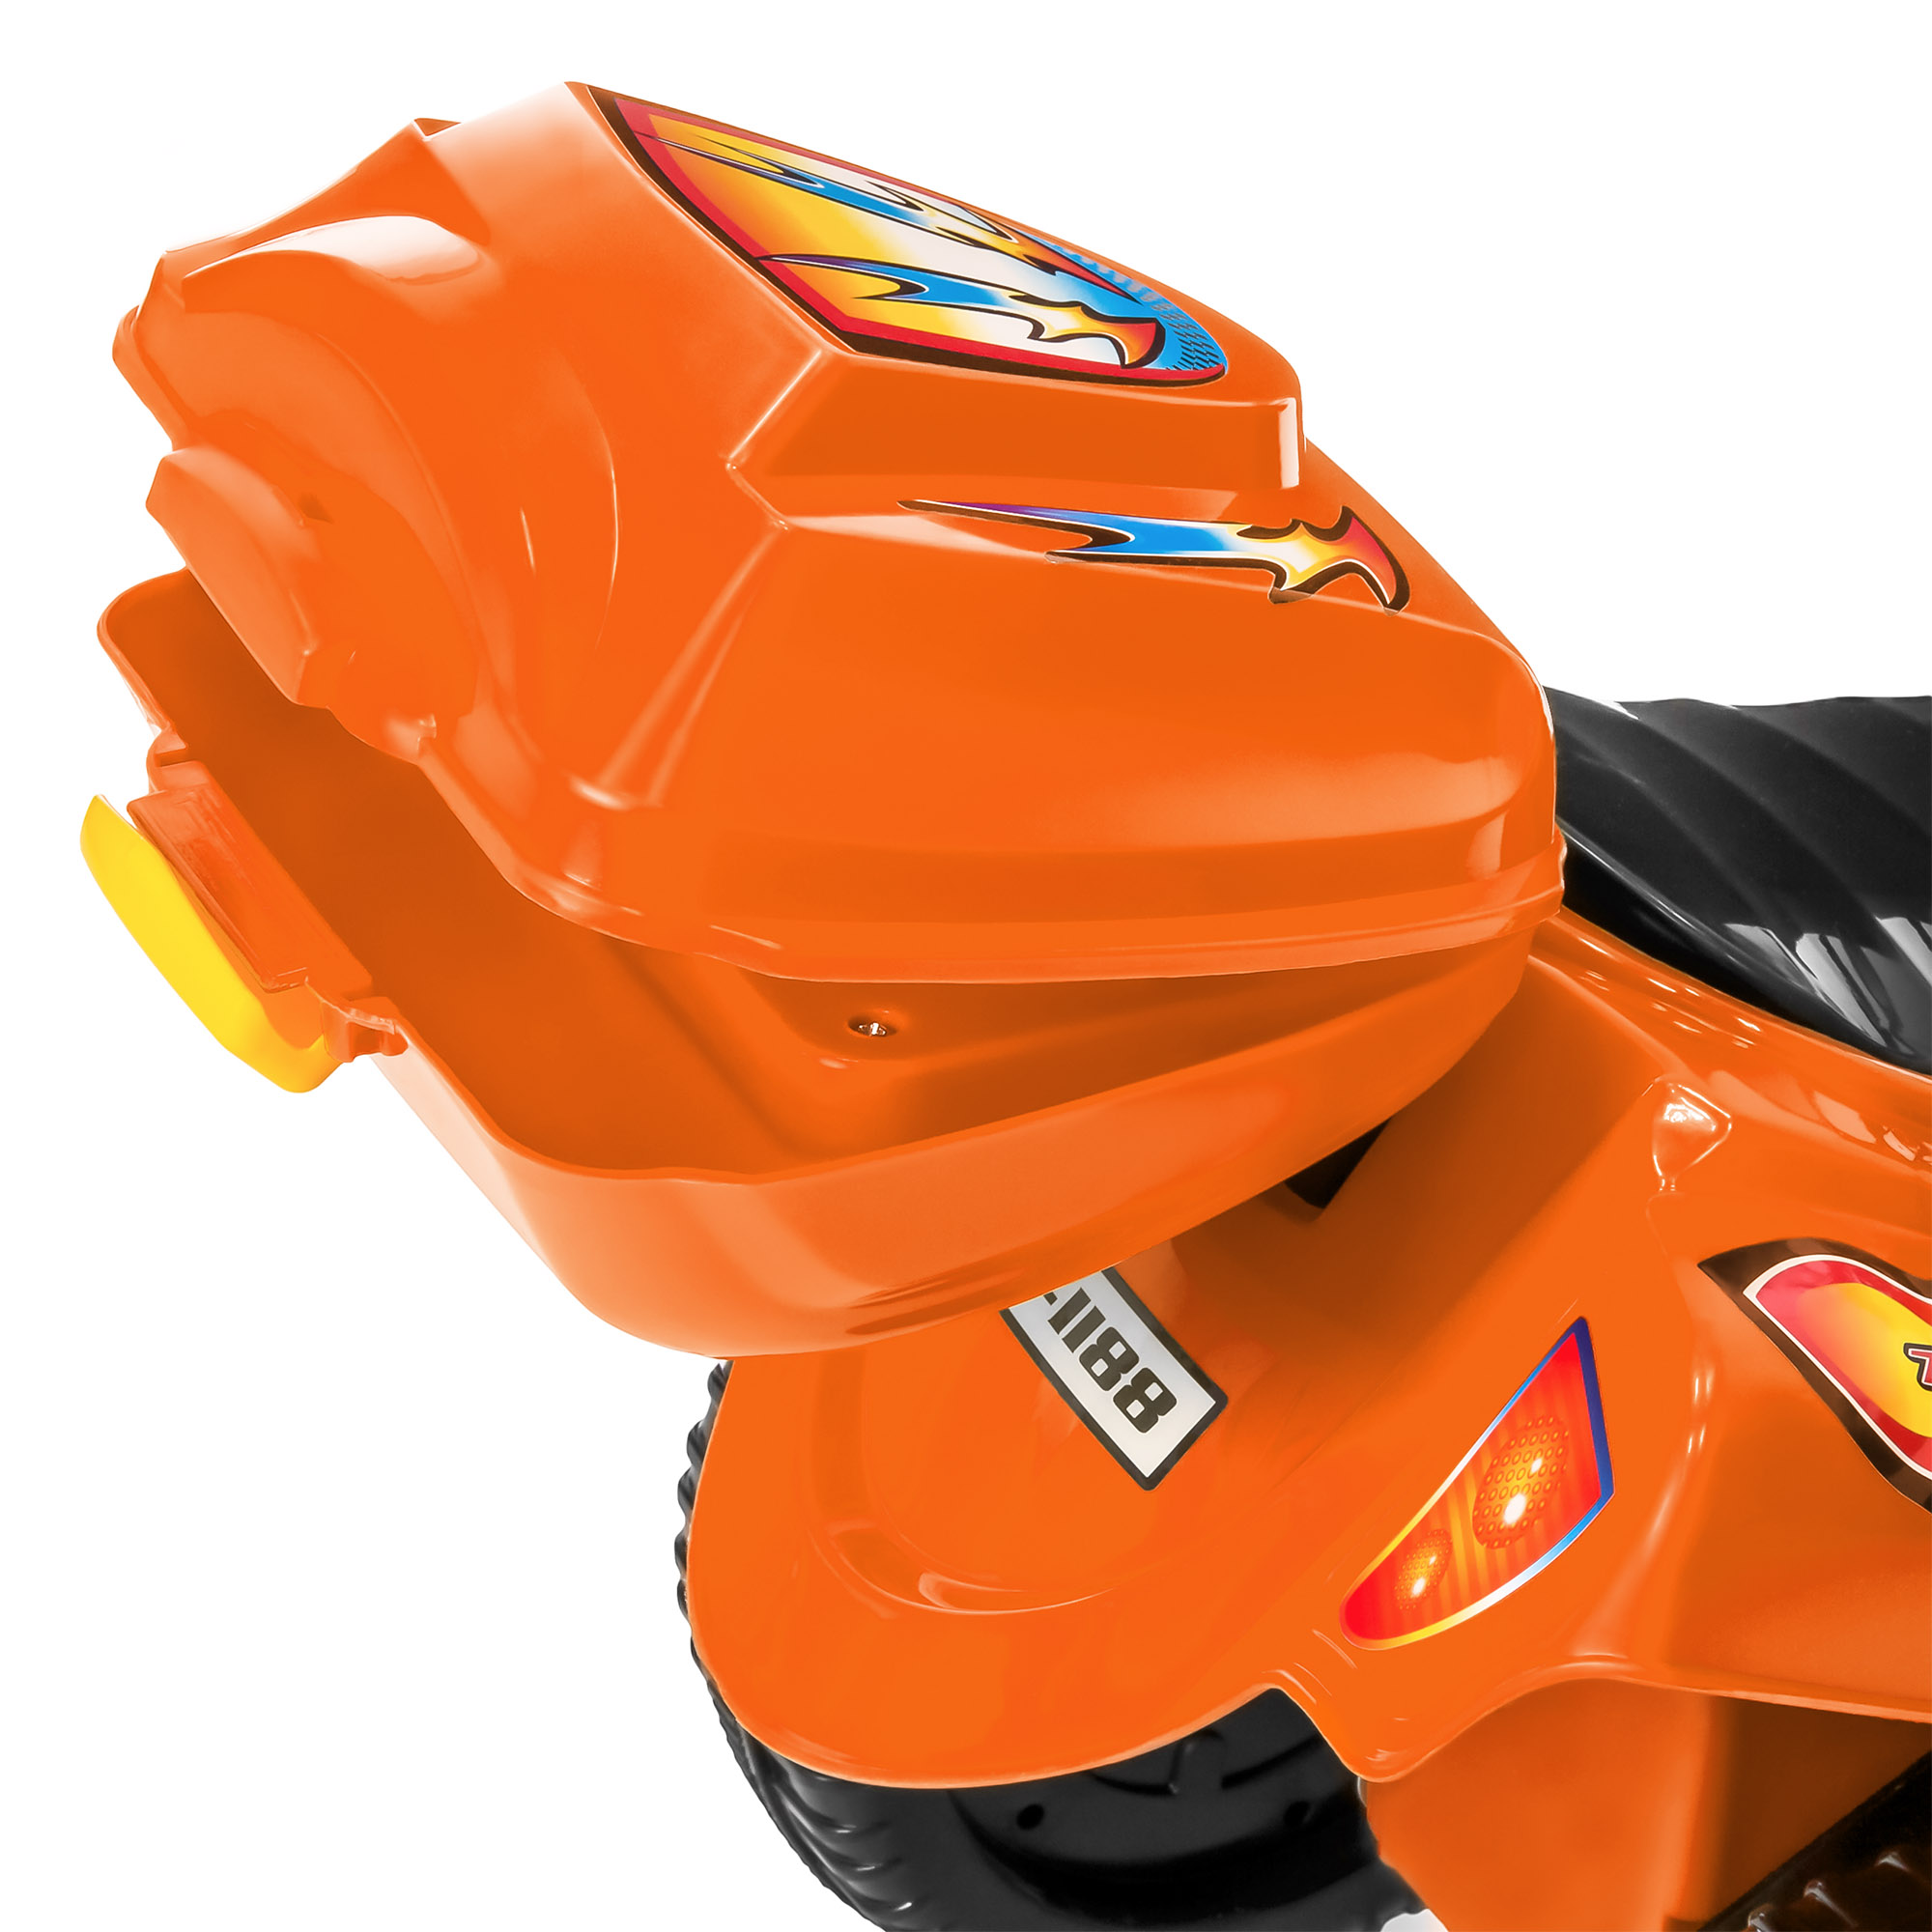 BCP-6V-Kids-3-Wheel-Motorcycle-Ride-On-Toy-w-LED-Lights-Music-Storage thumbnail 22